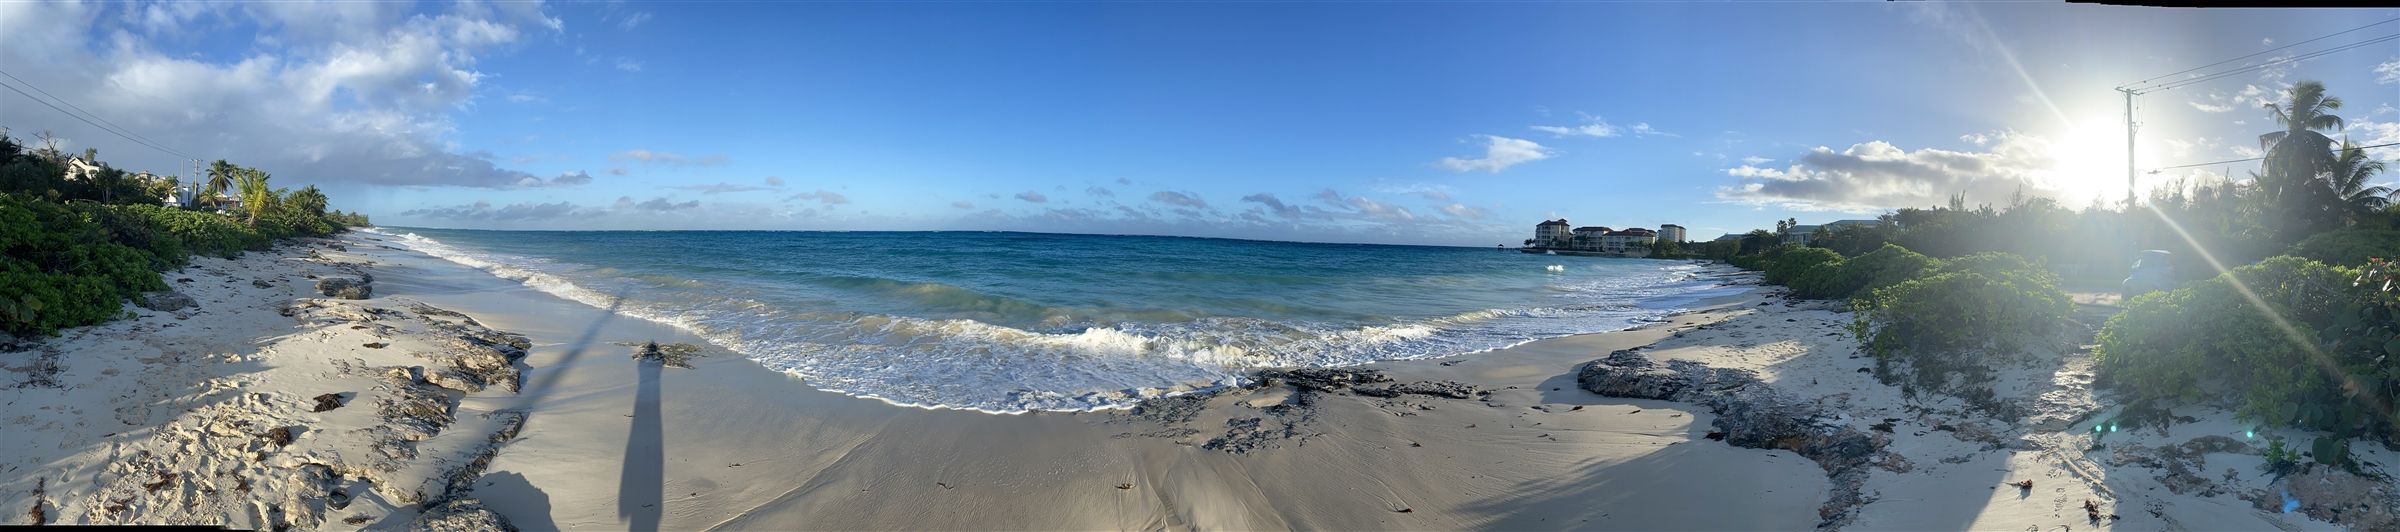 Geraise Bahamas